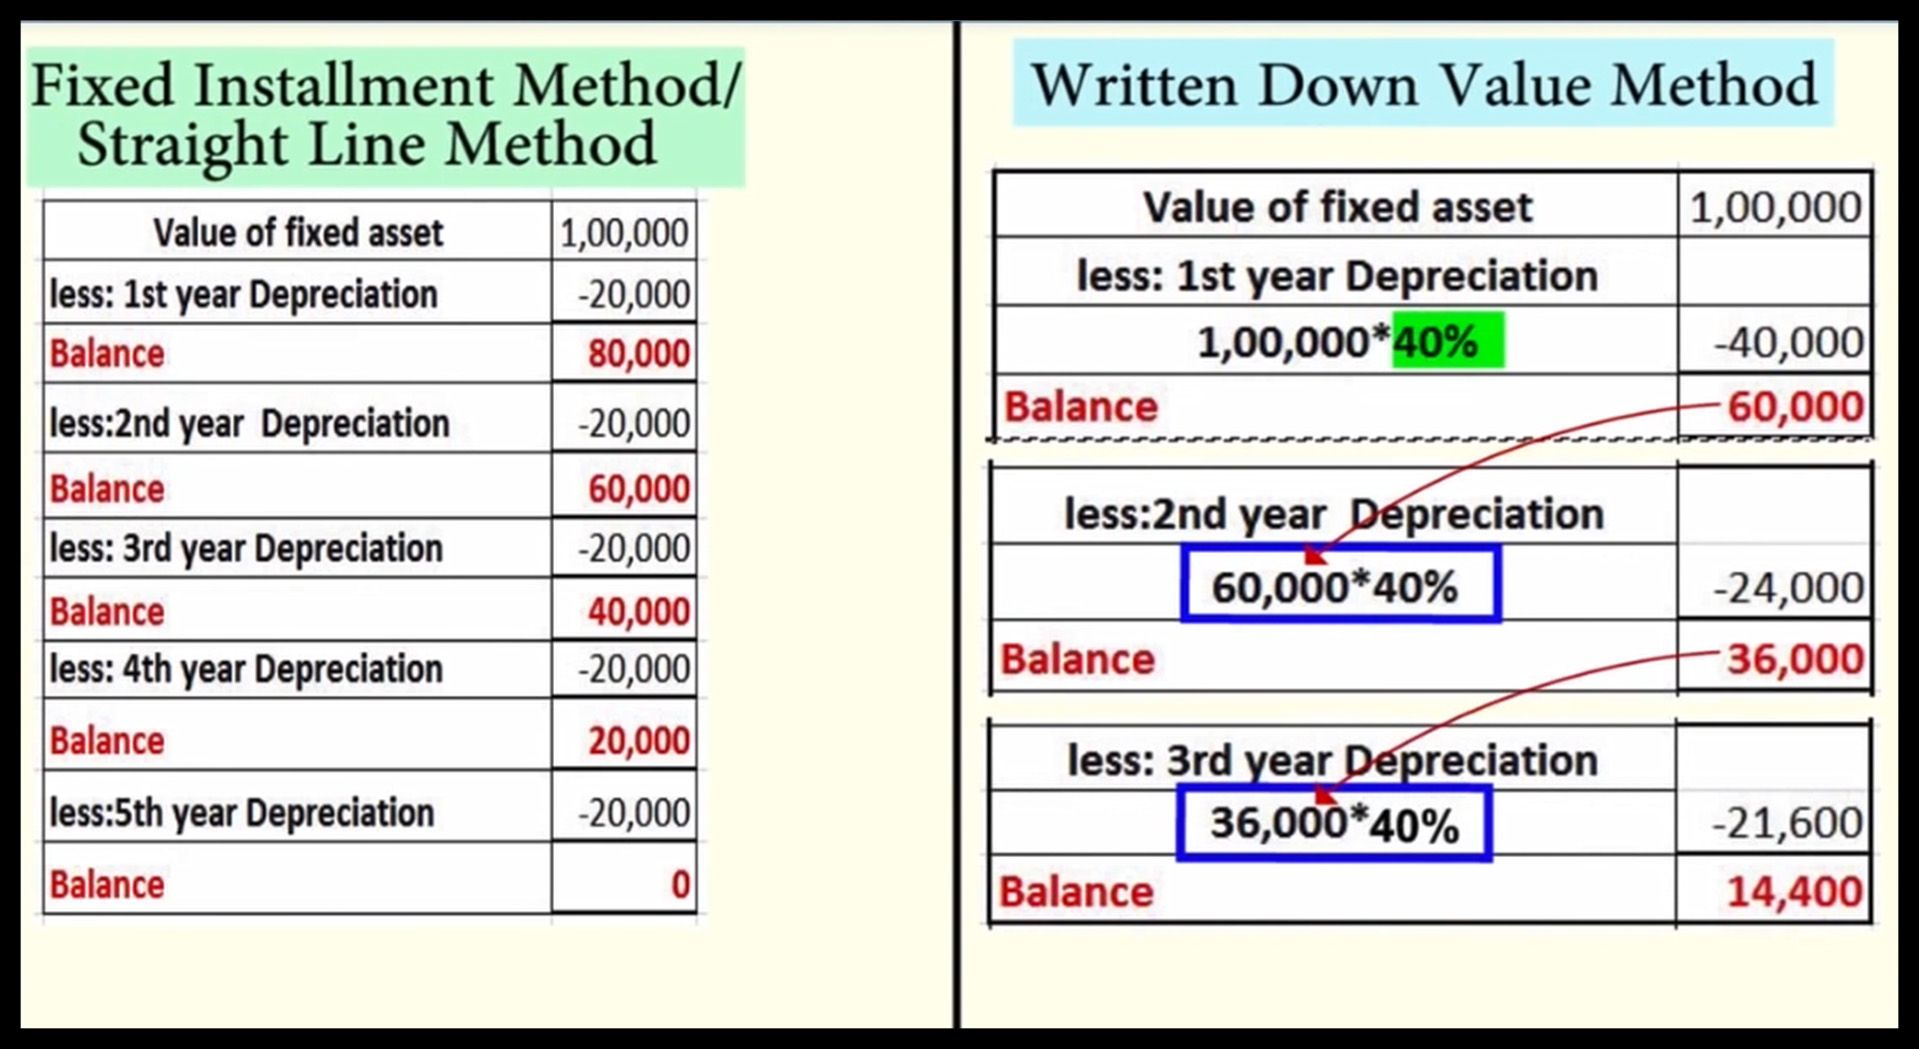 Fixed Installation Method Straight Line Method Written Down